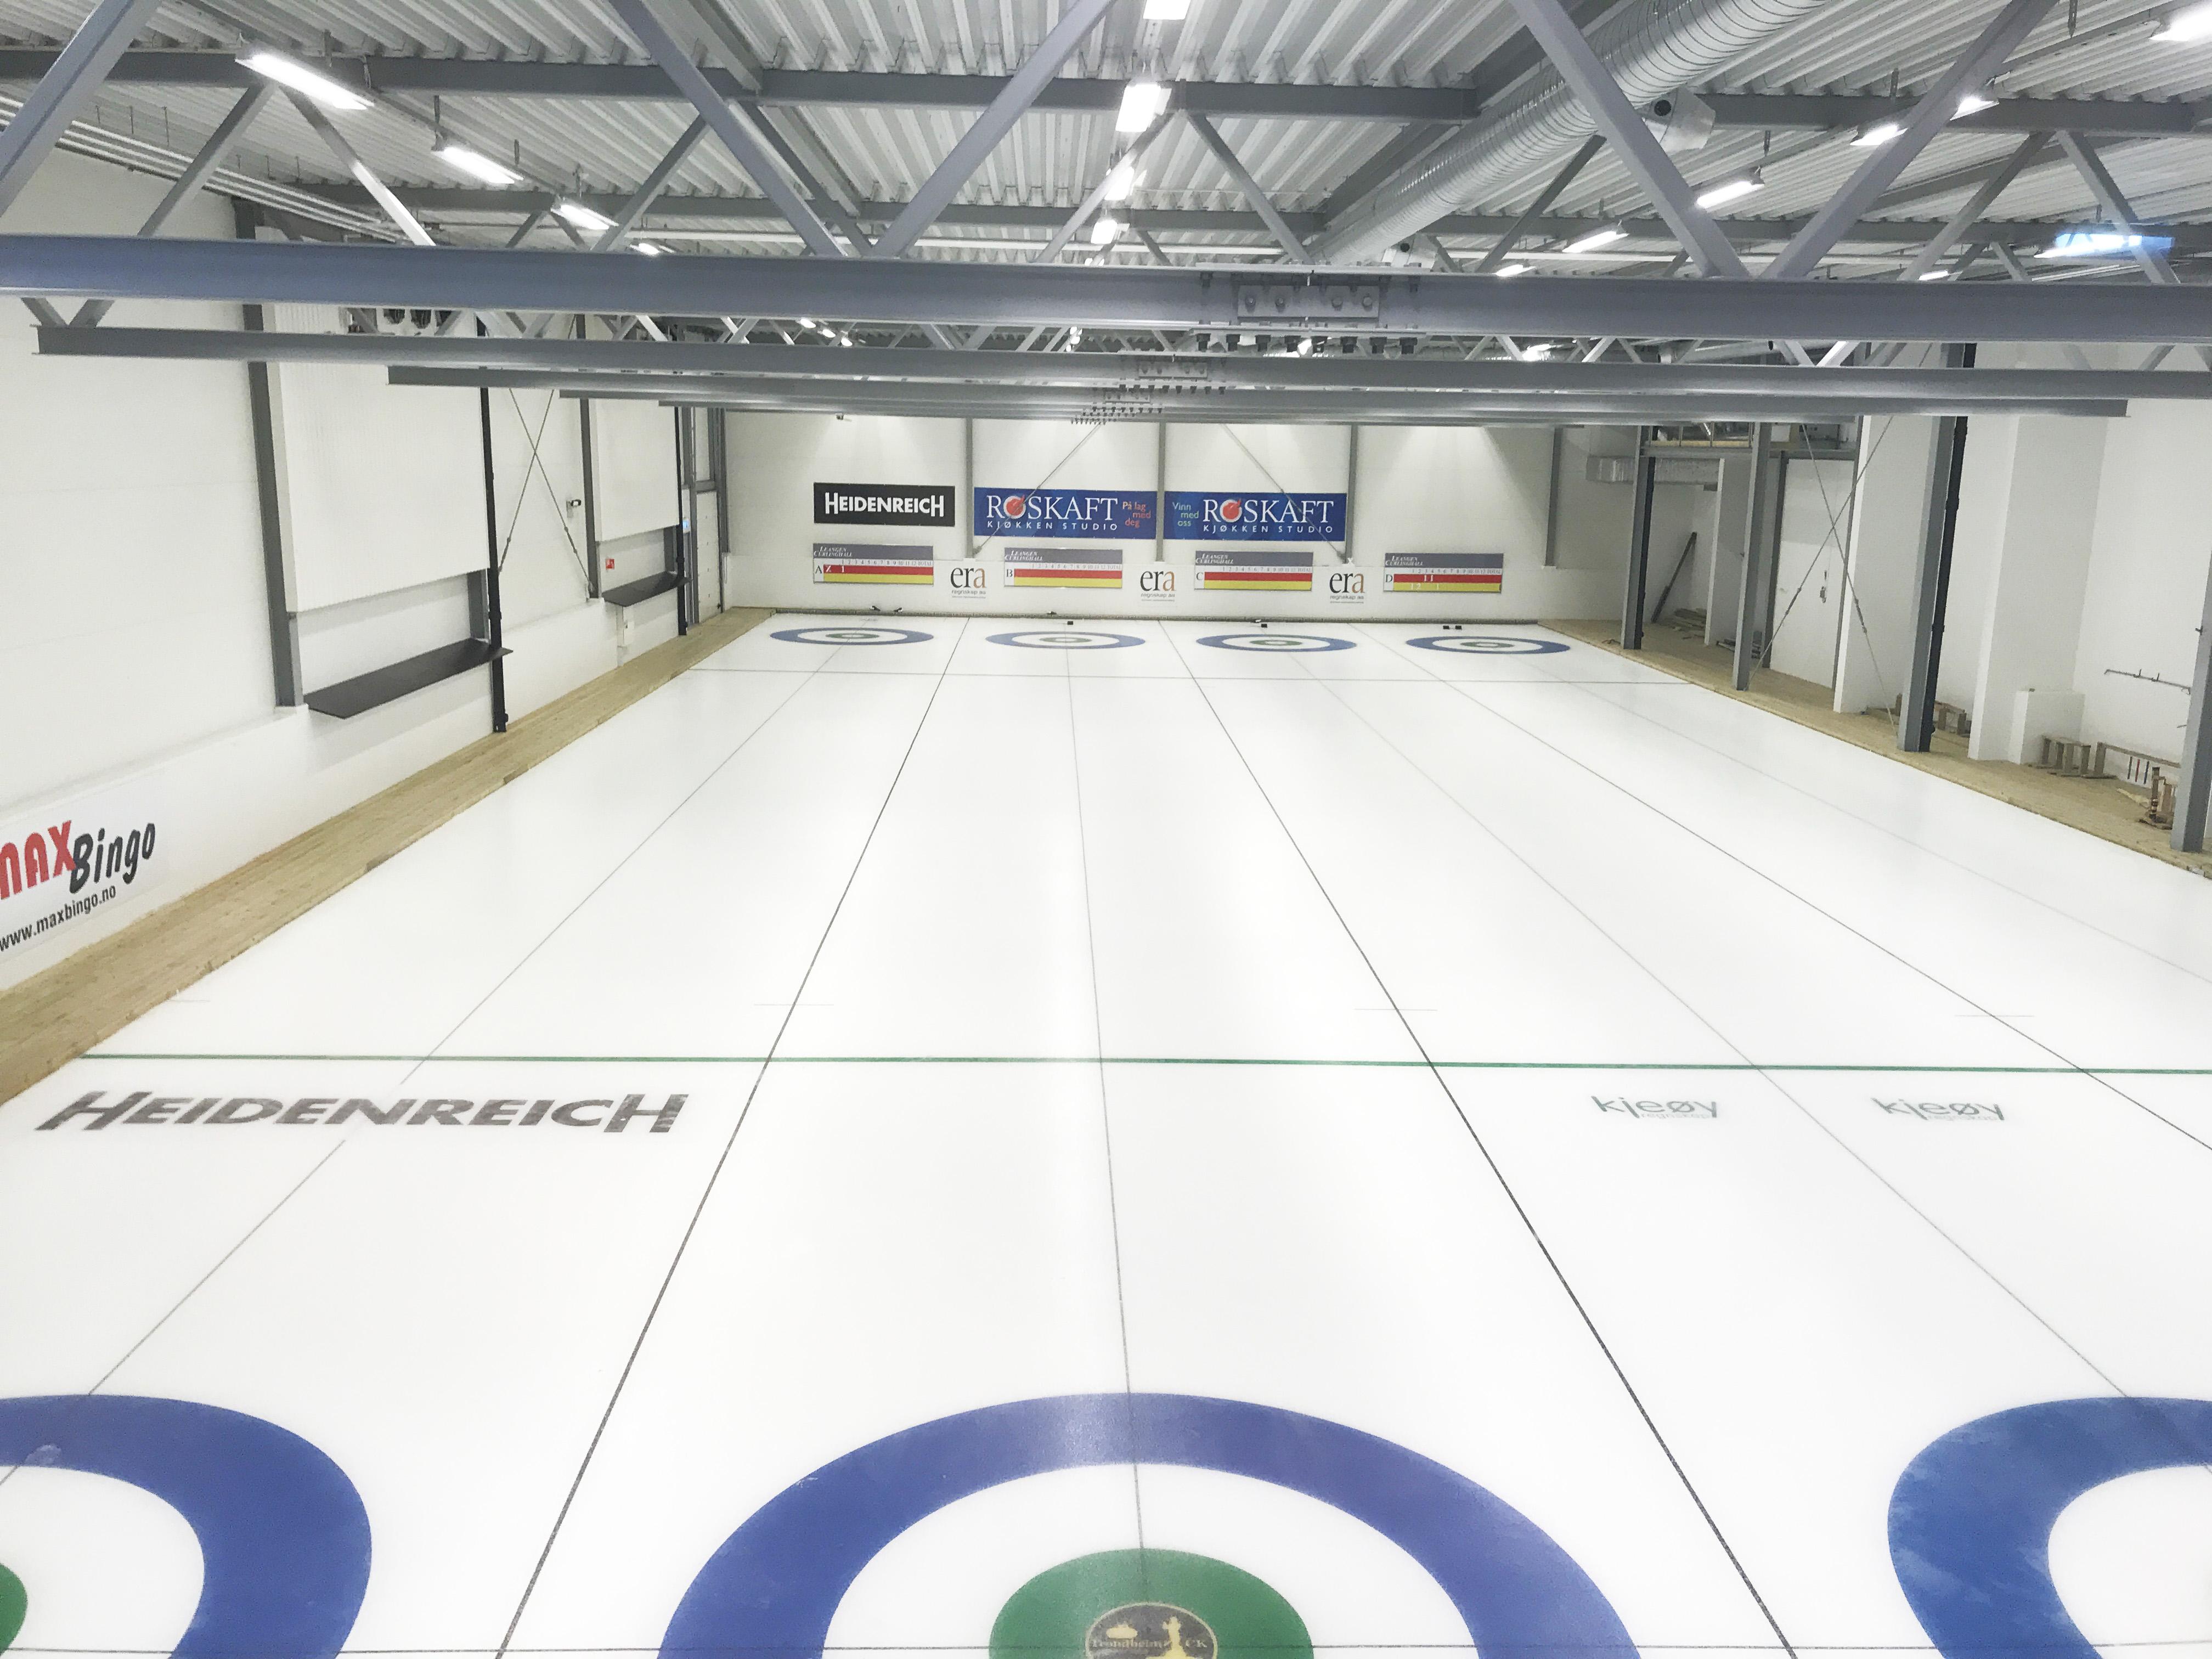 Leangen curlinghall isbaner